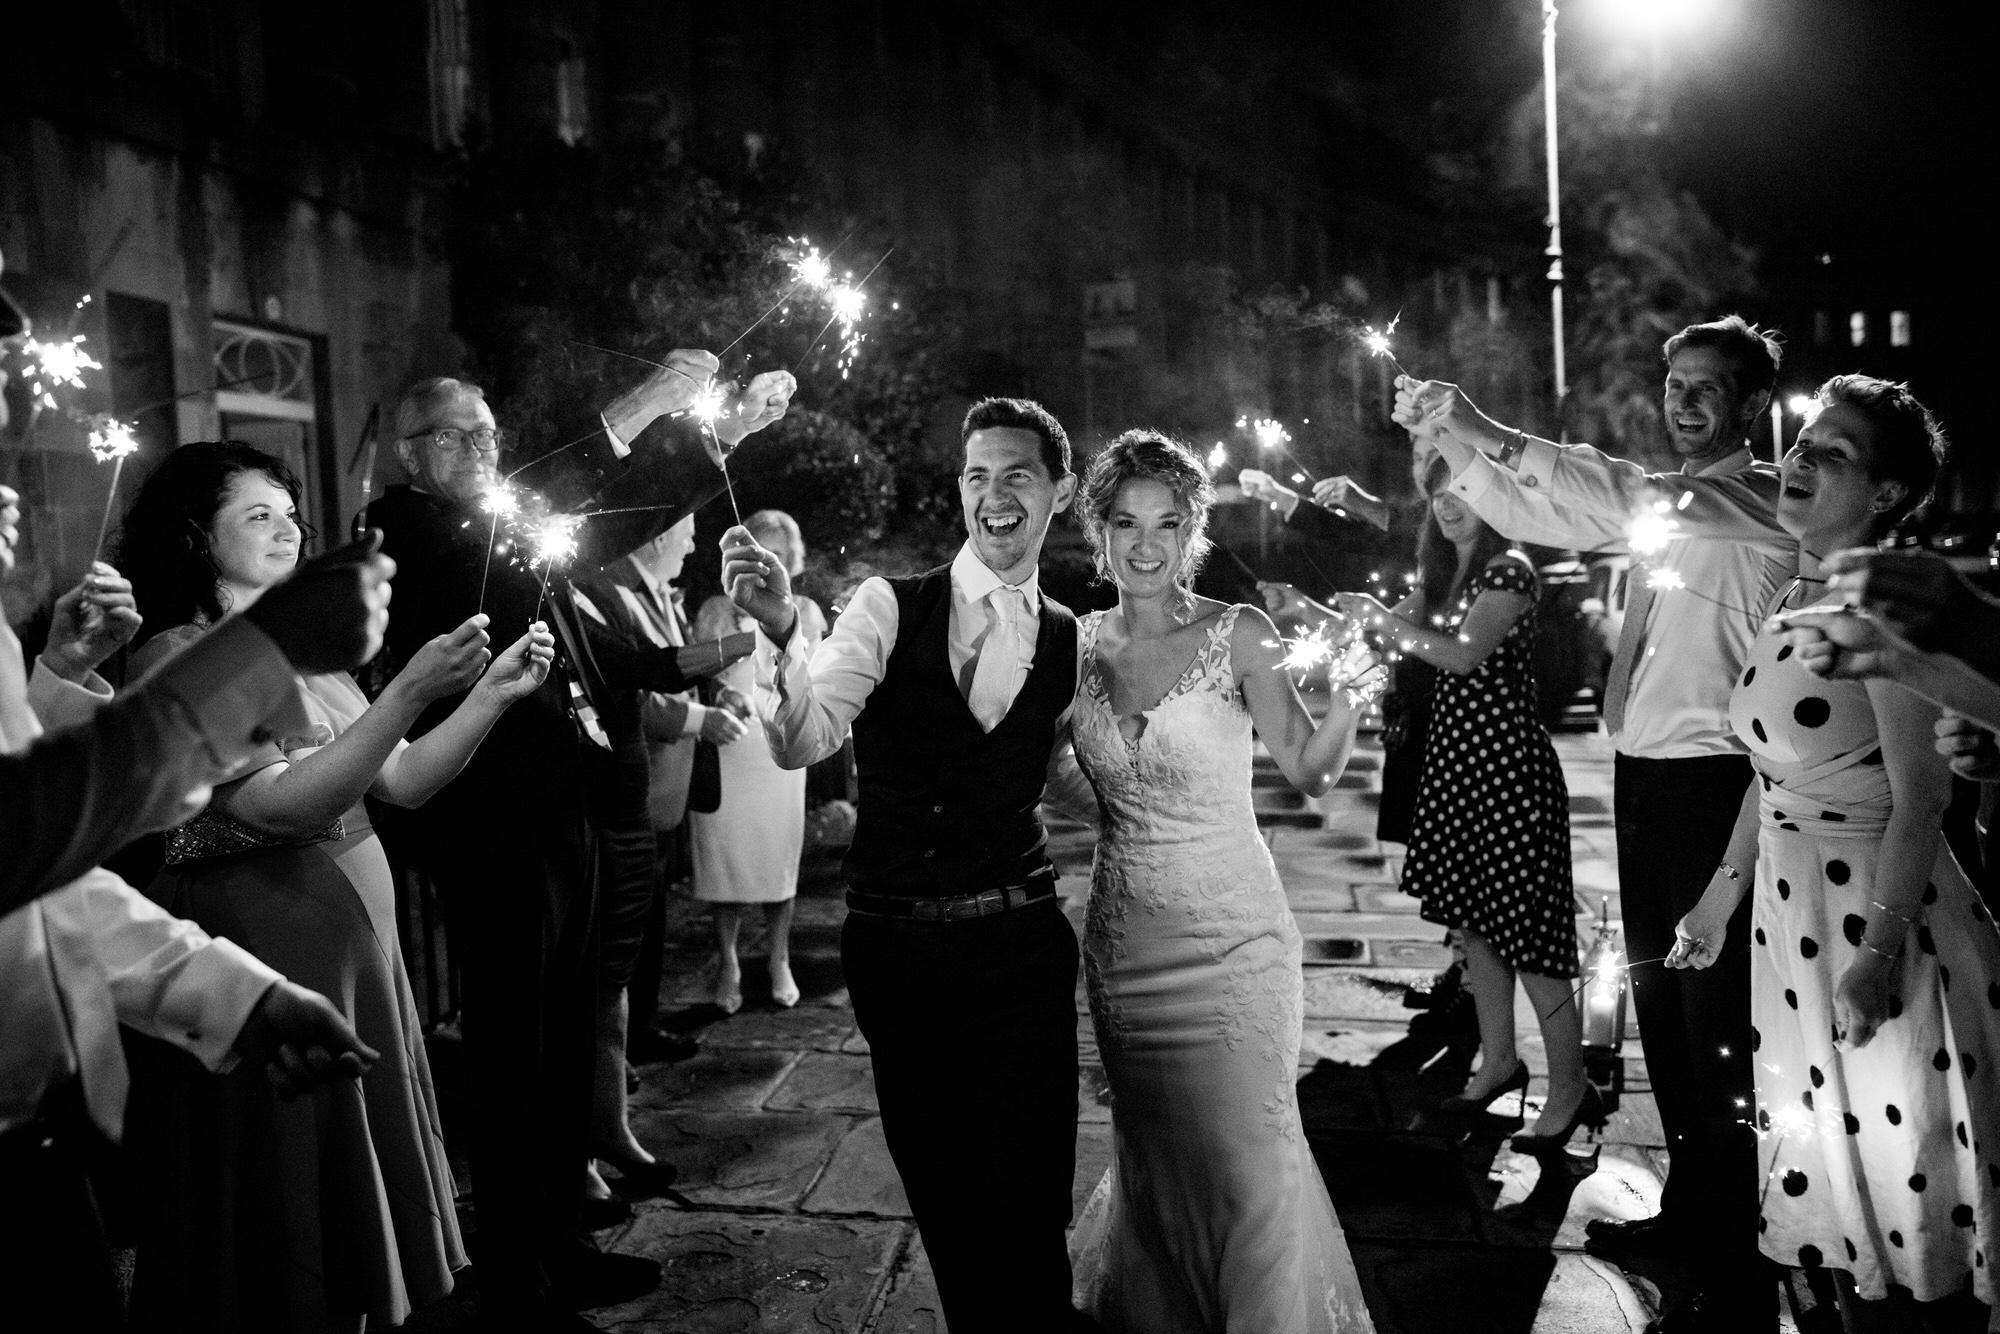 Royal crescent hotel wedding